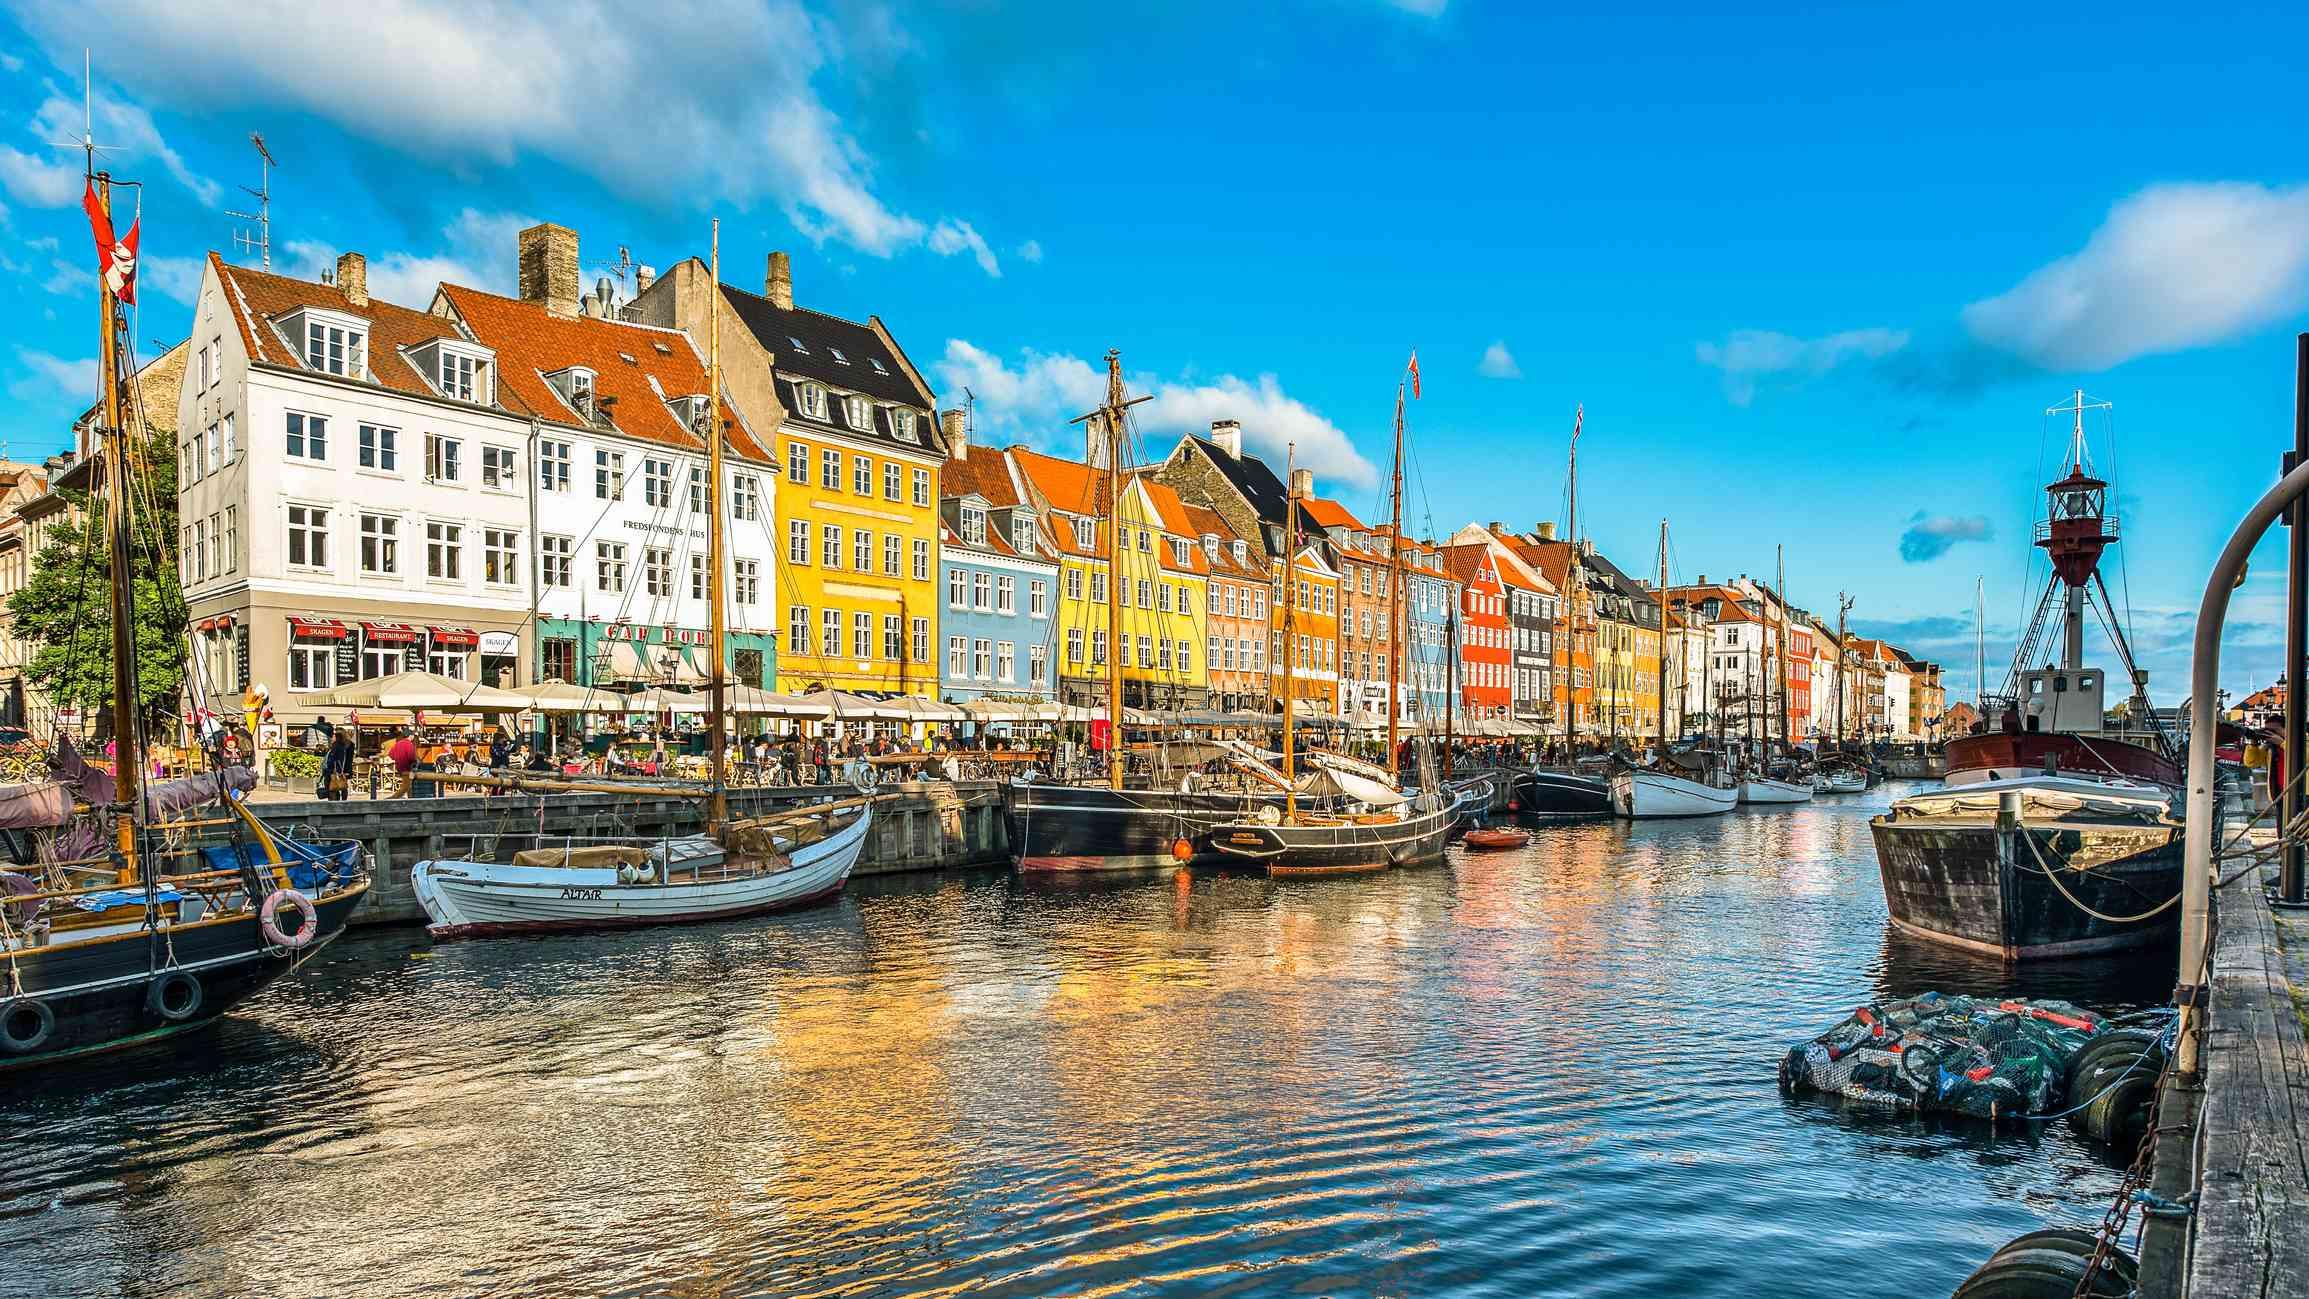 Nyhavn Canal in Copenhagen, Denmark